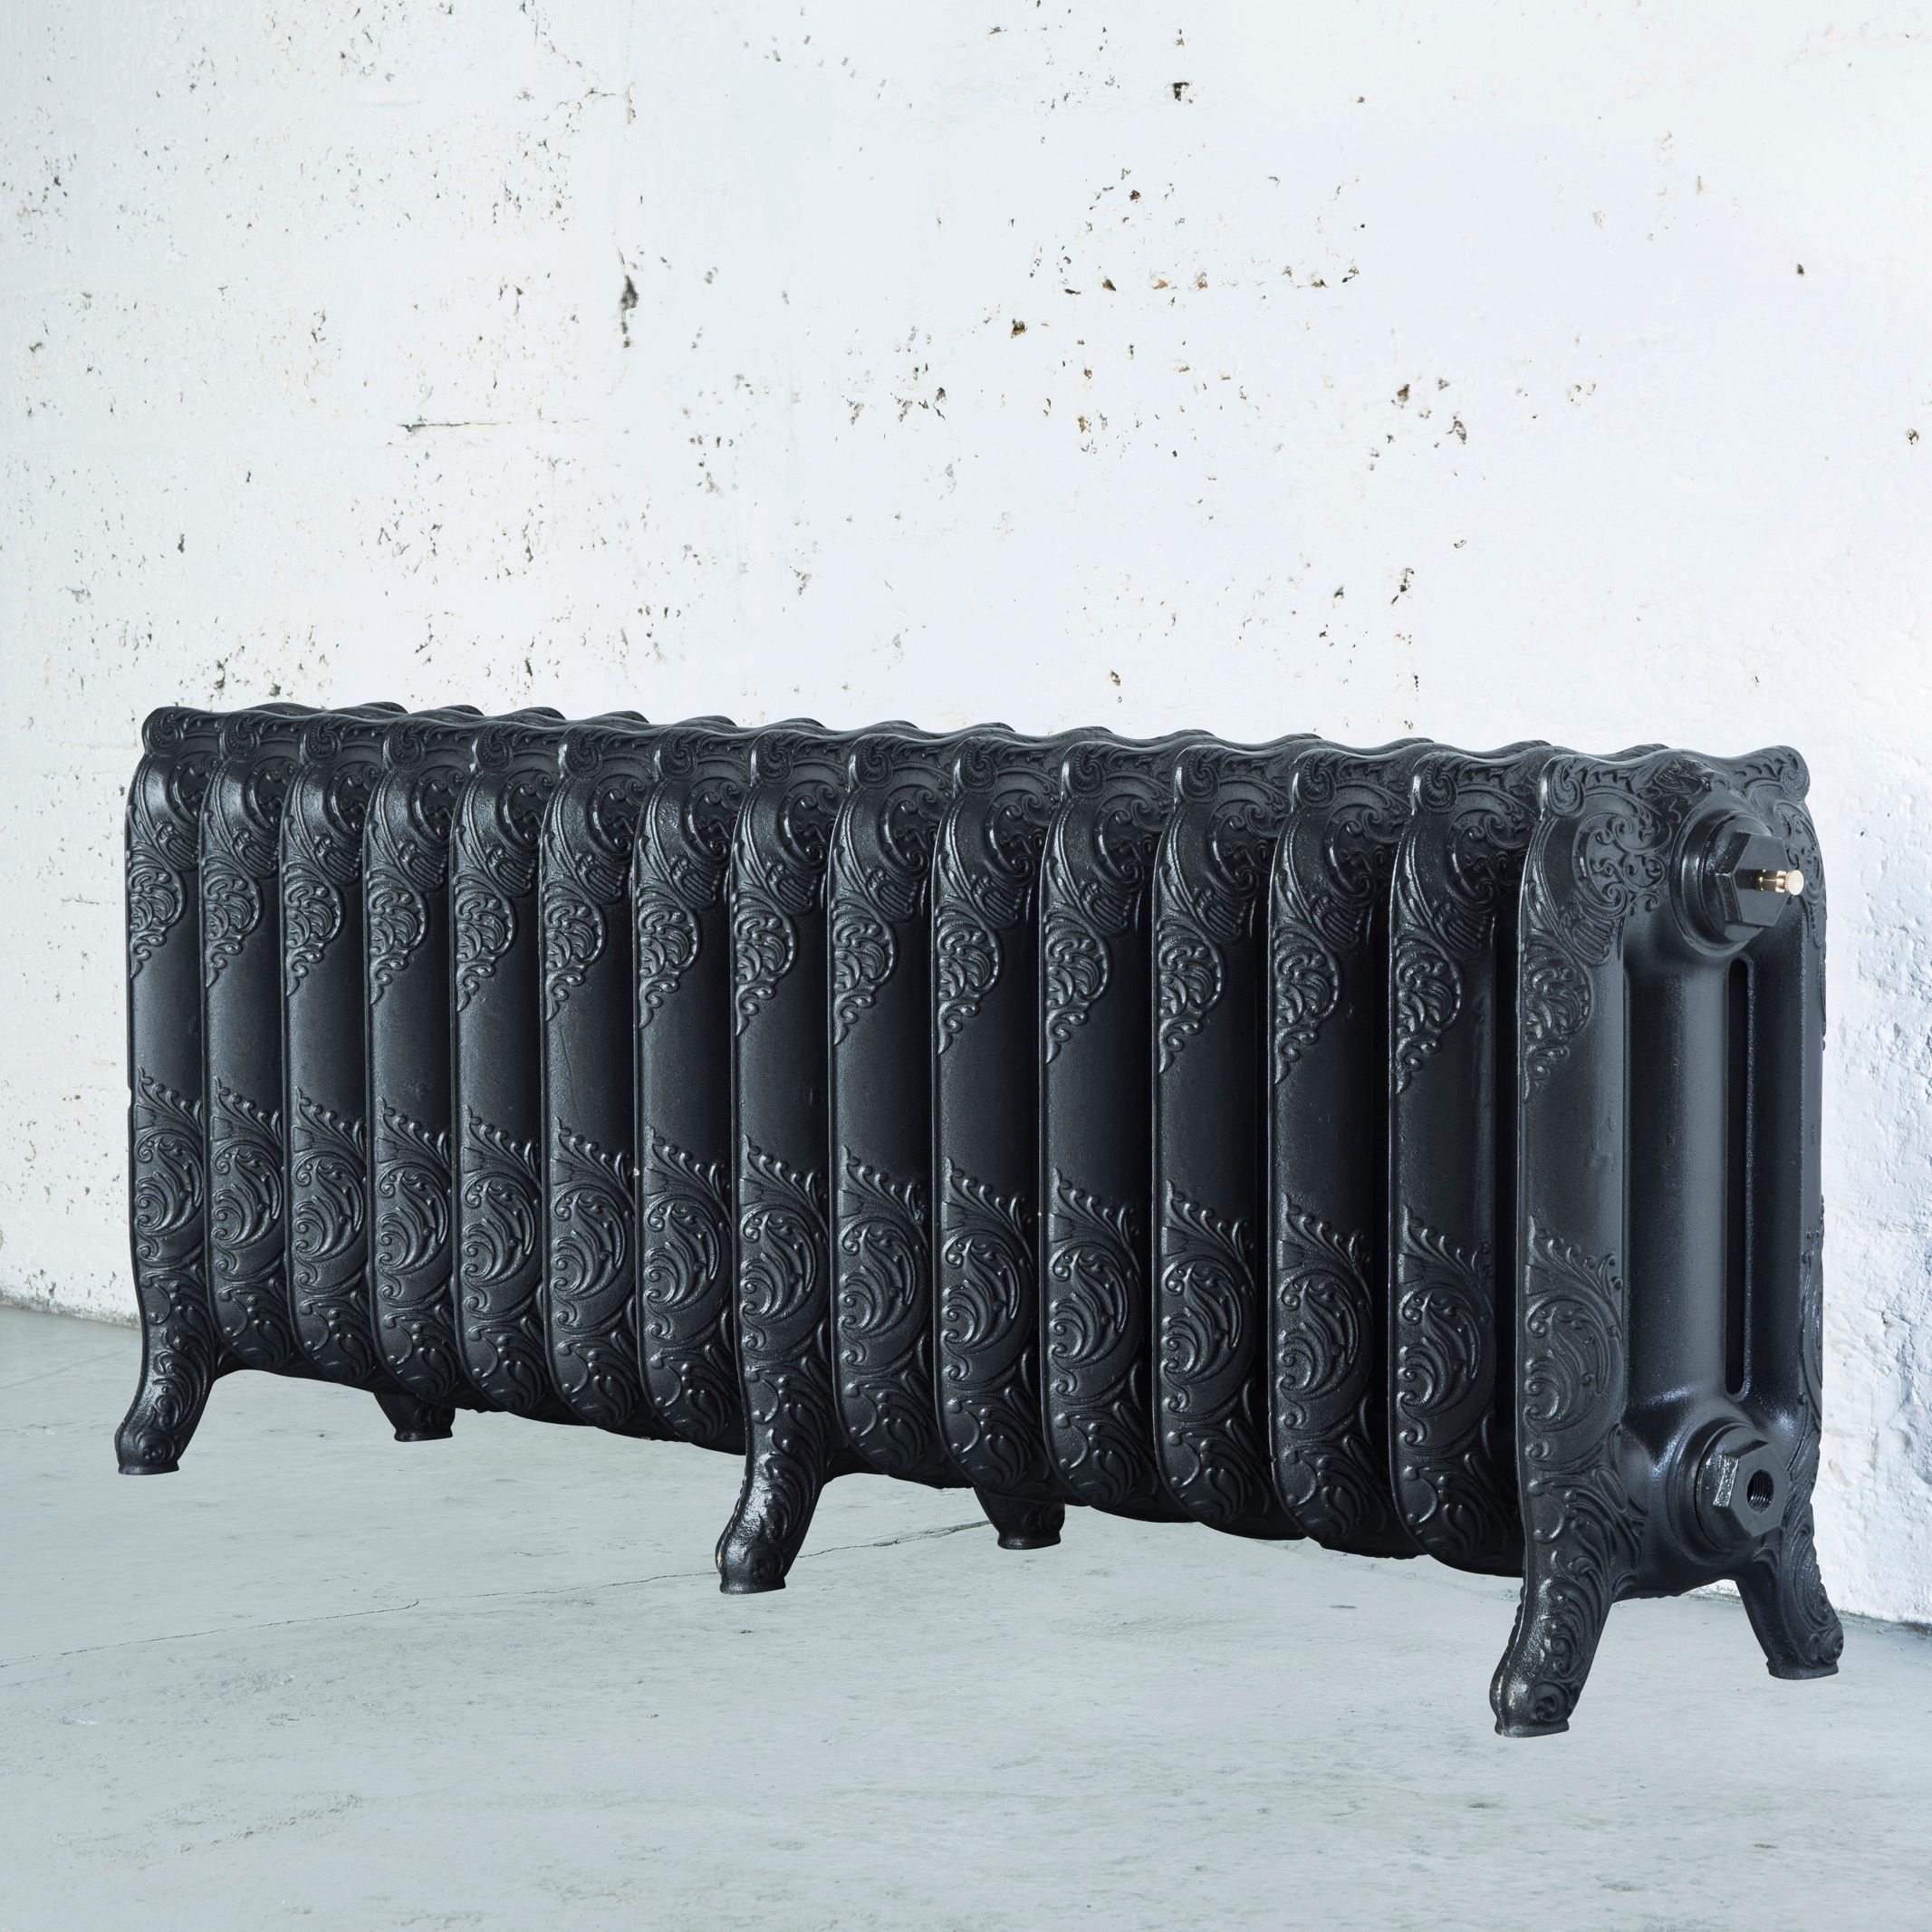 Arroll Montmartre 3 Column radiator, Pewter (W)1234mm (H)470mm